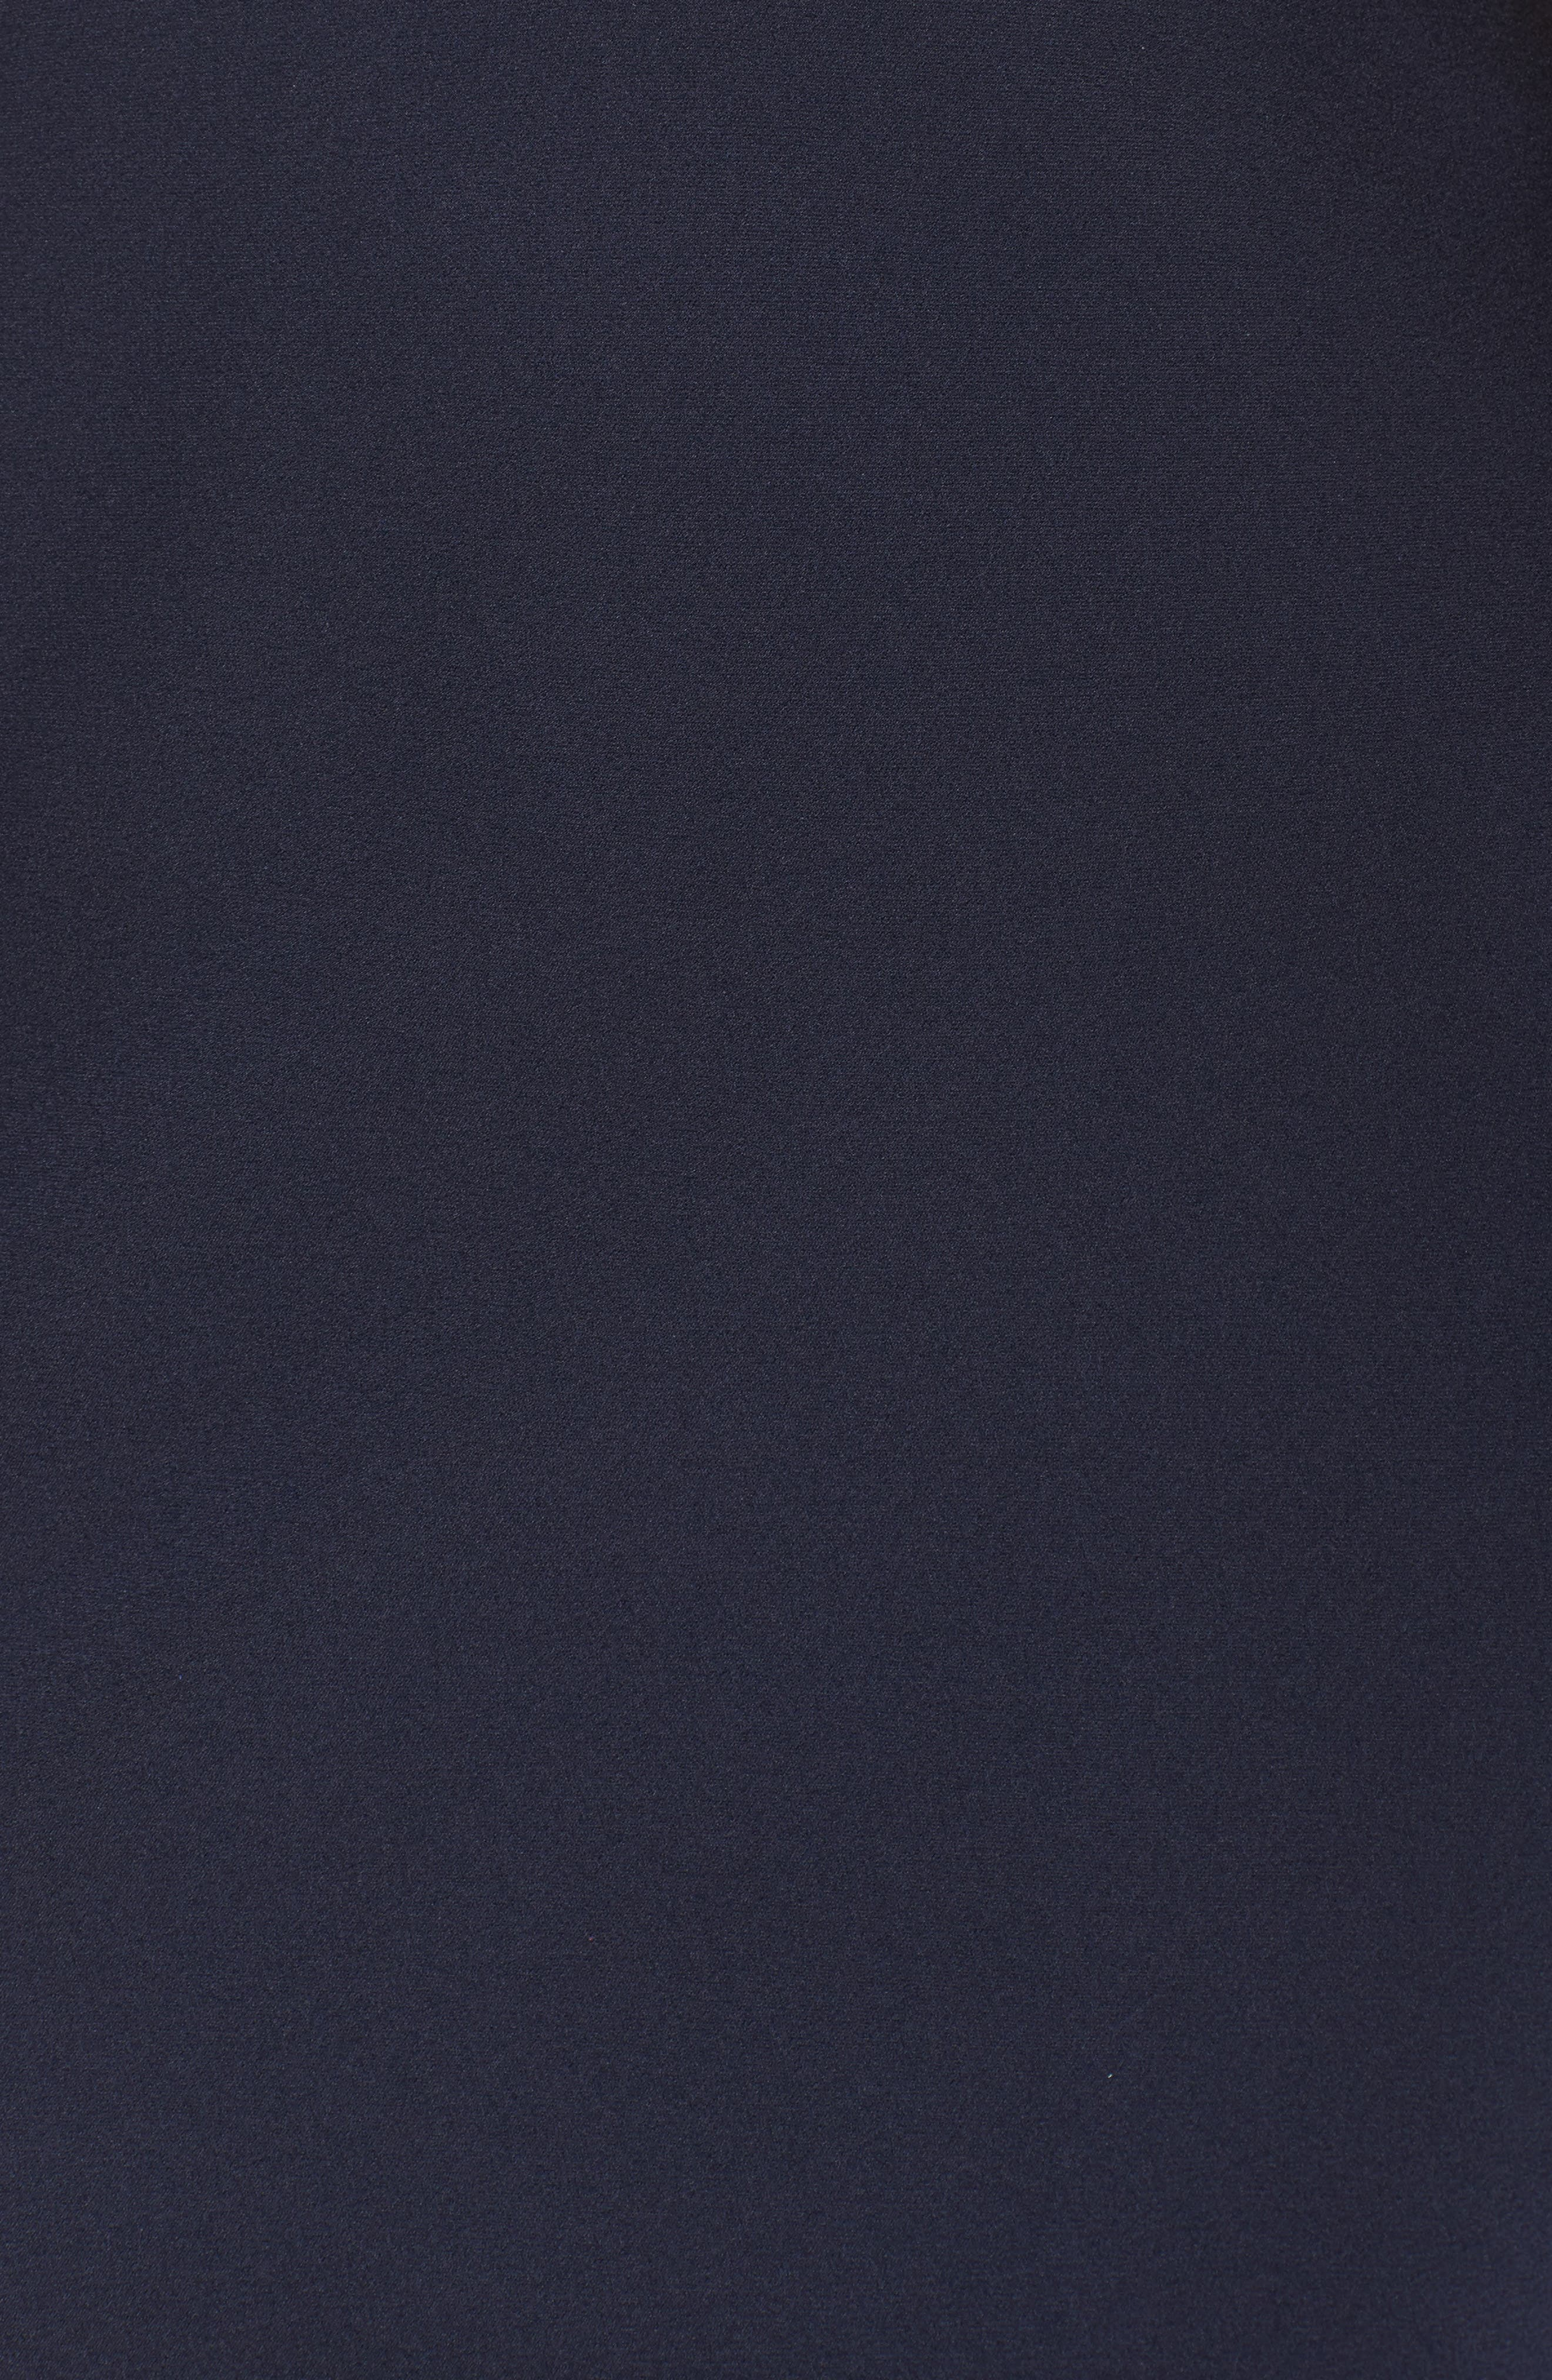 Cutout Detail Satin Gown,                             Alternate thumbnail 5, color,                             NAVY